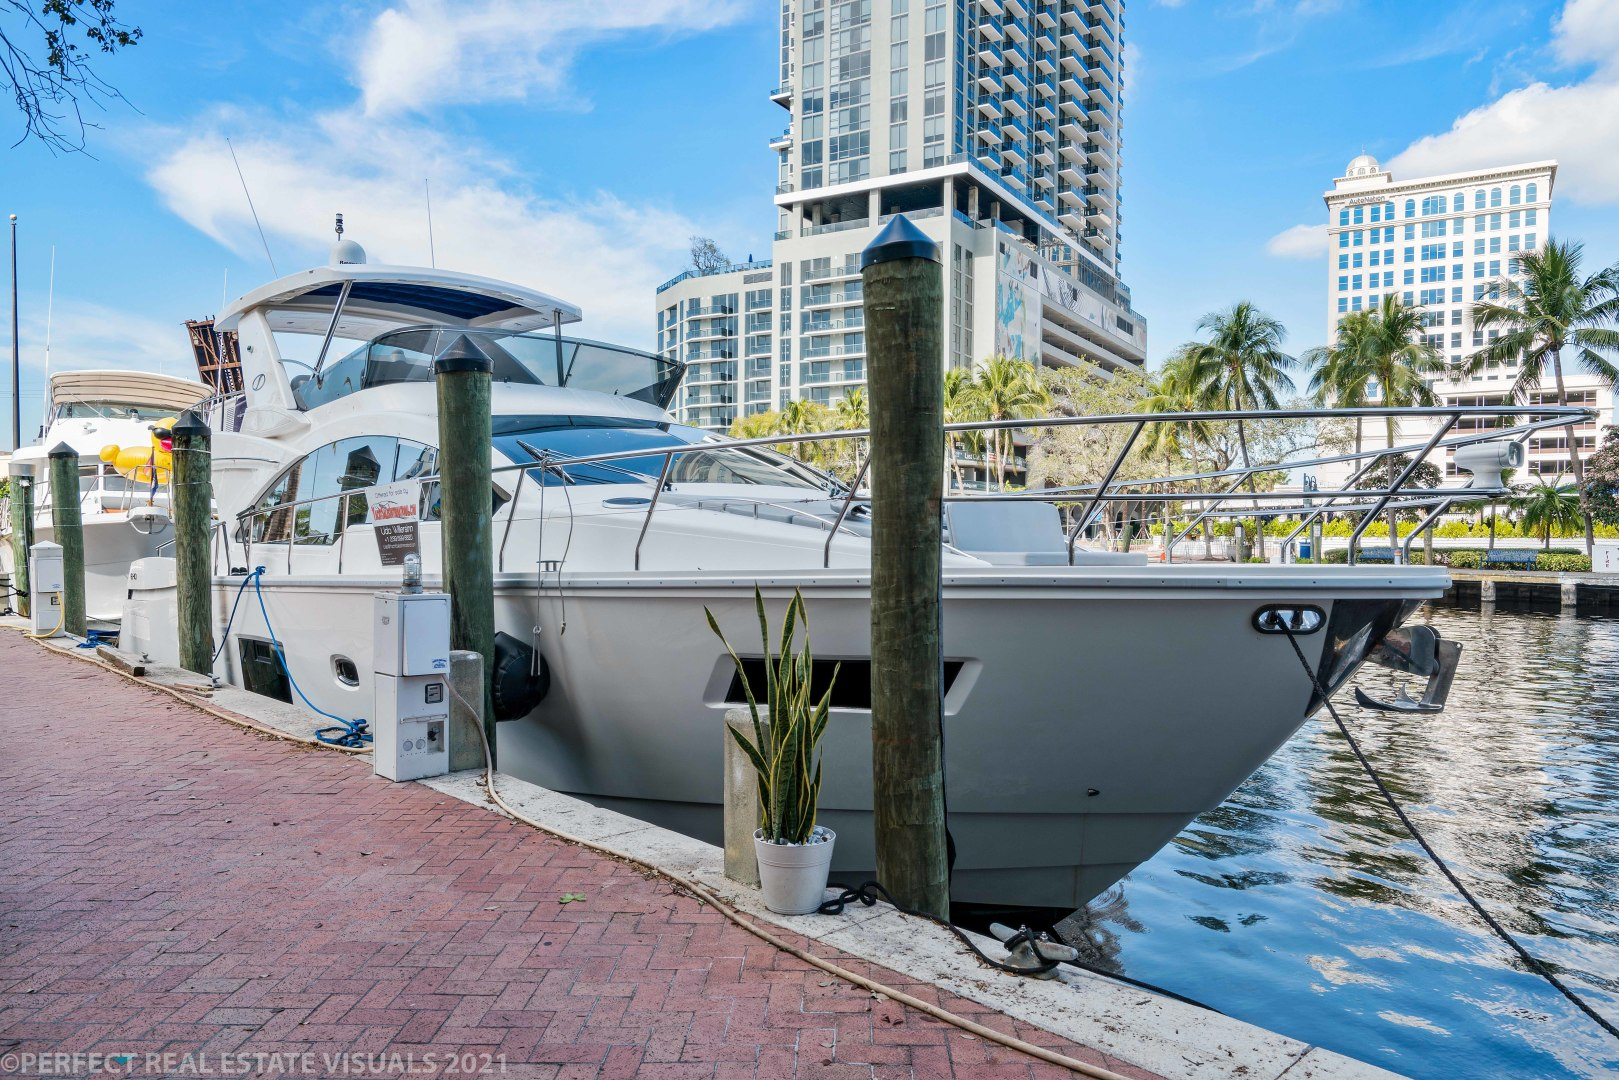 Schaefer-640 2017 -Fort Lauderdale-United States-1600565 | Thumbnail